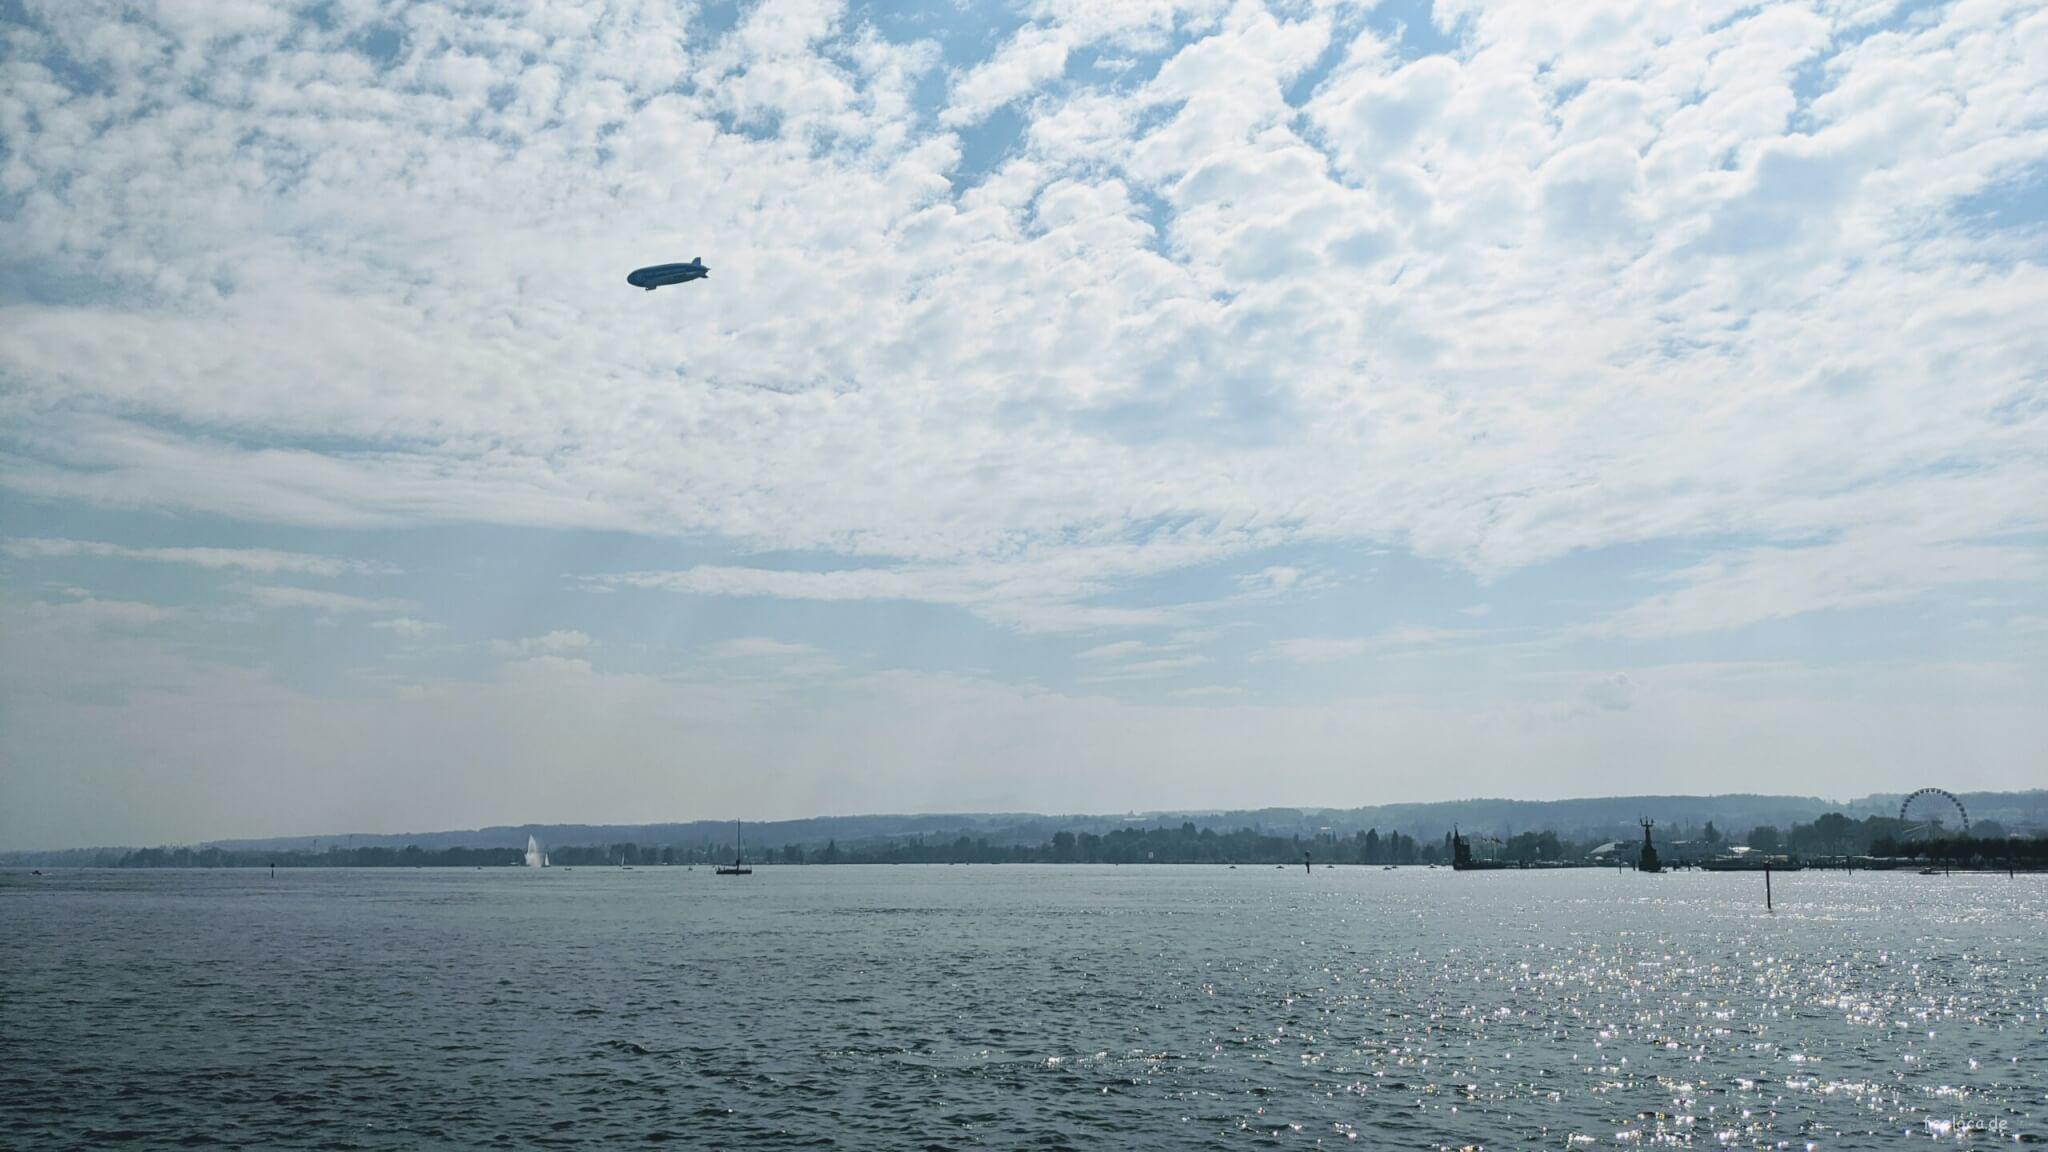 Bodensee Zeppelin